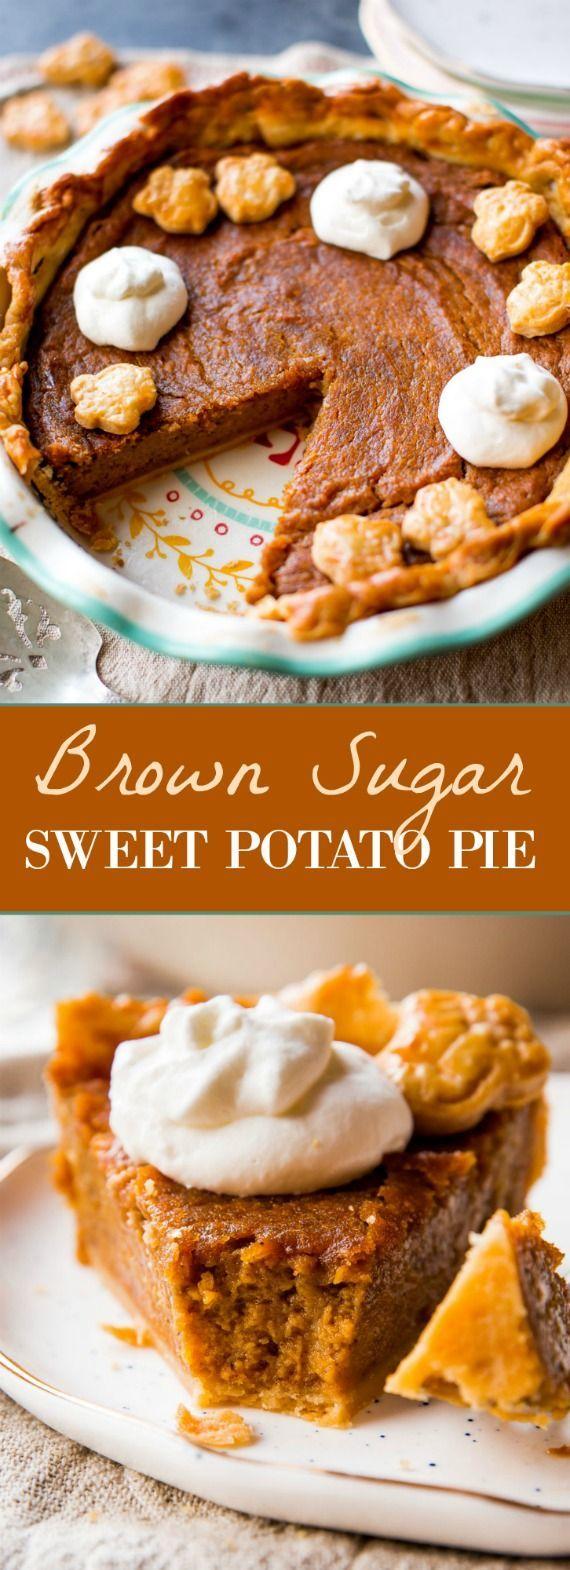 Homemade sweet potato pie! Made with dark brown sugar, 2 sweet potatoes, and cinnamon spice. Thanksgiving pie recipe on http://sallysbakingaddiction.com